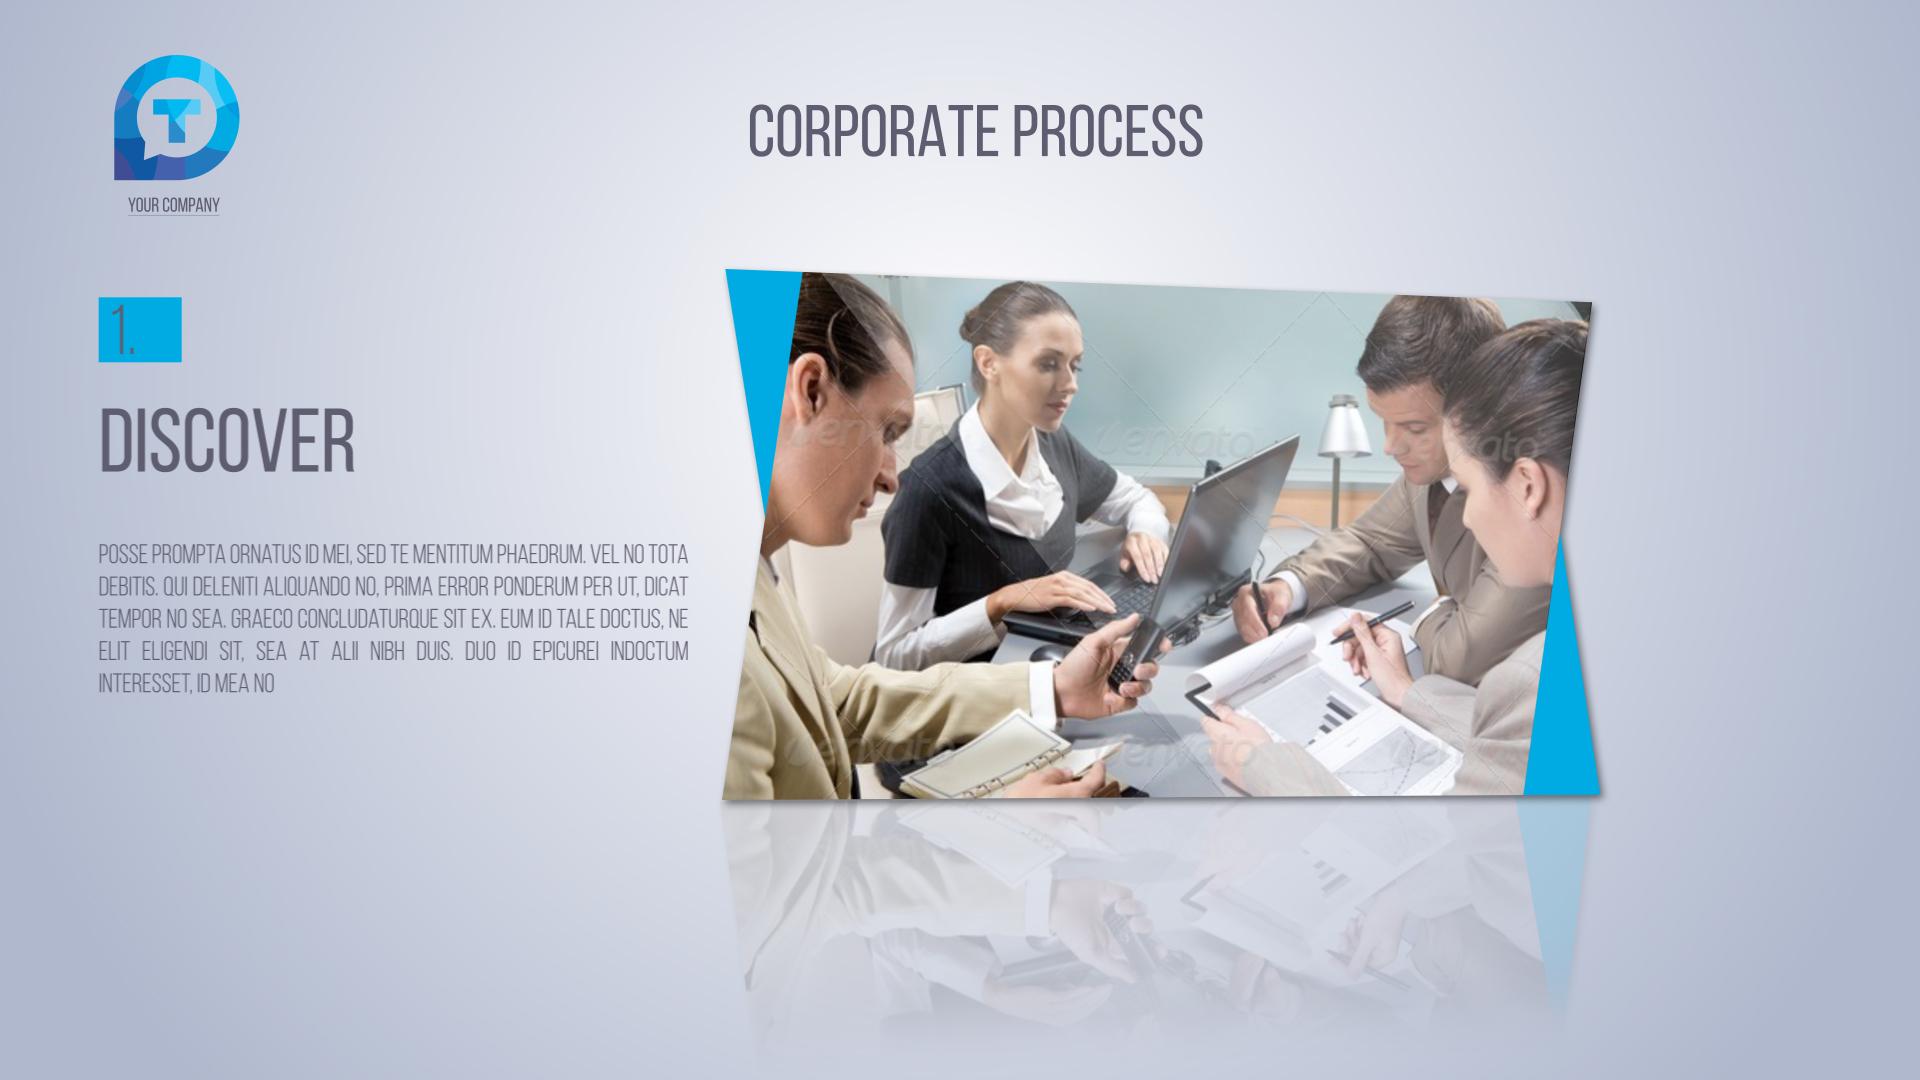 Corporate Presentation - 8